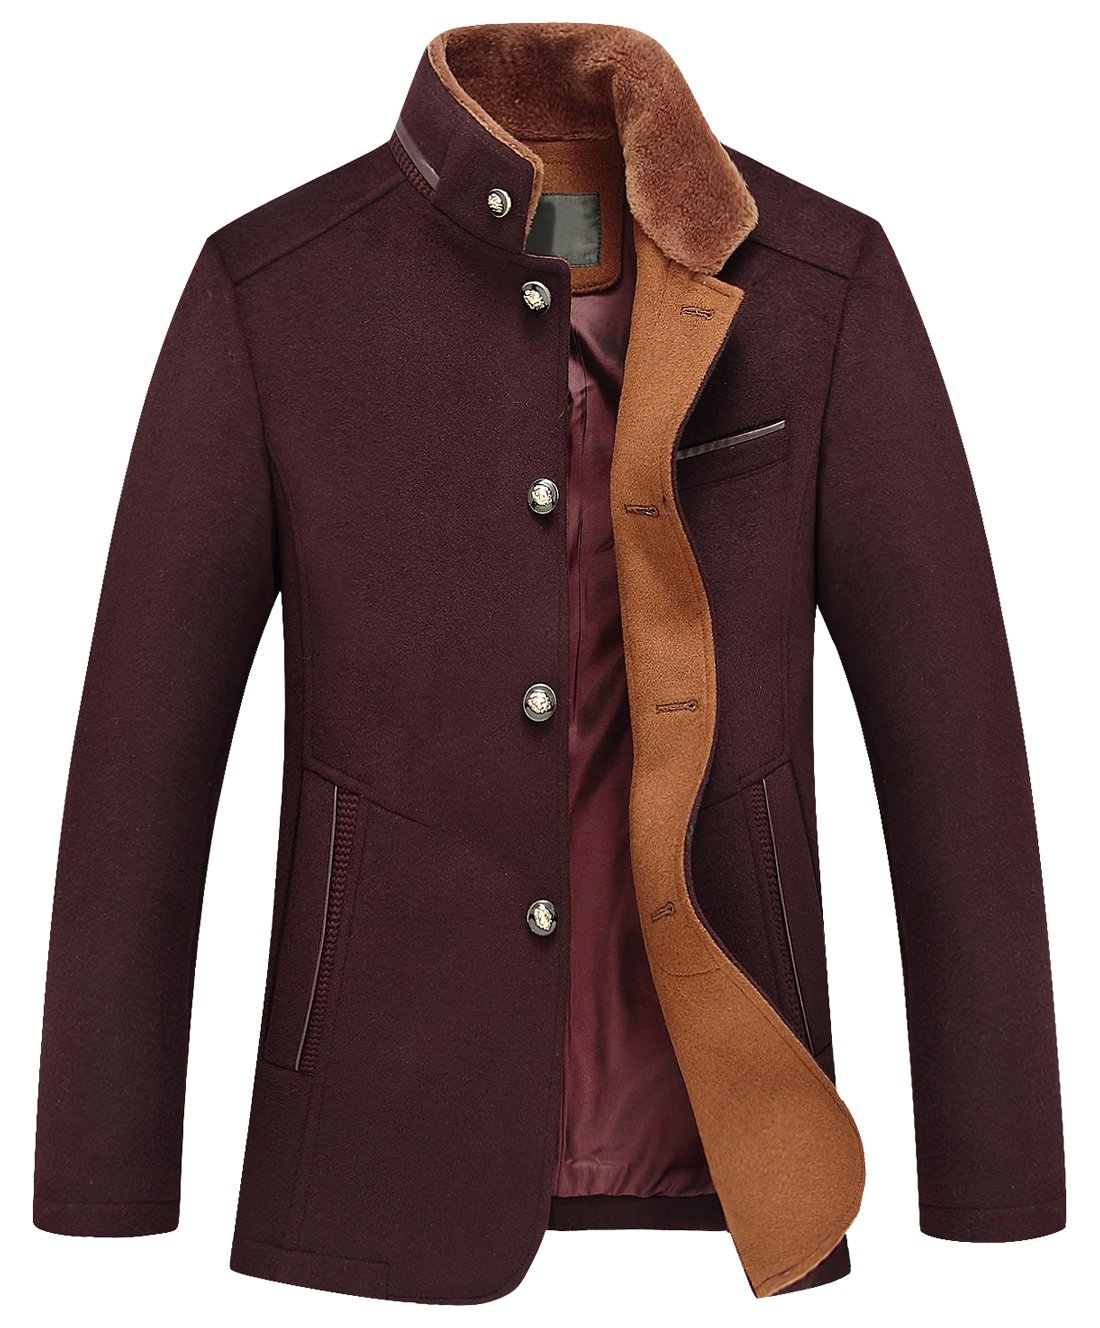 Chouyatou Men's Gentle Band Collar Single Breasted Wool Blend Pea Coat (10Dark Red, Small)